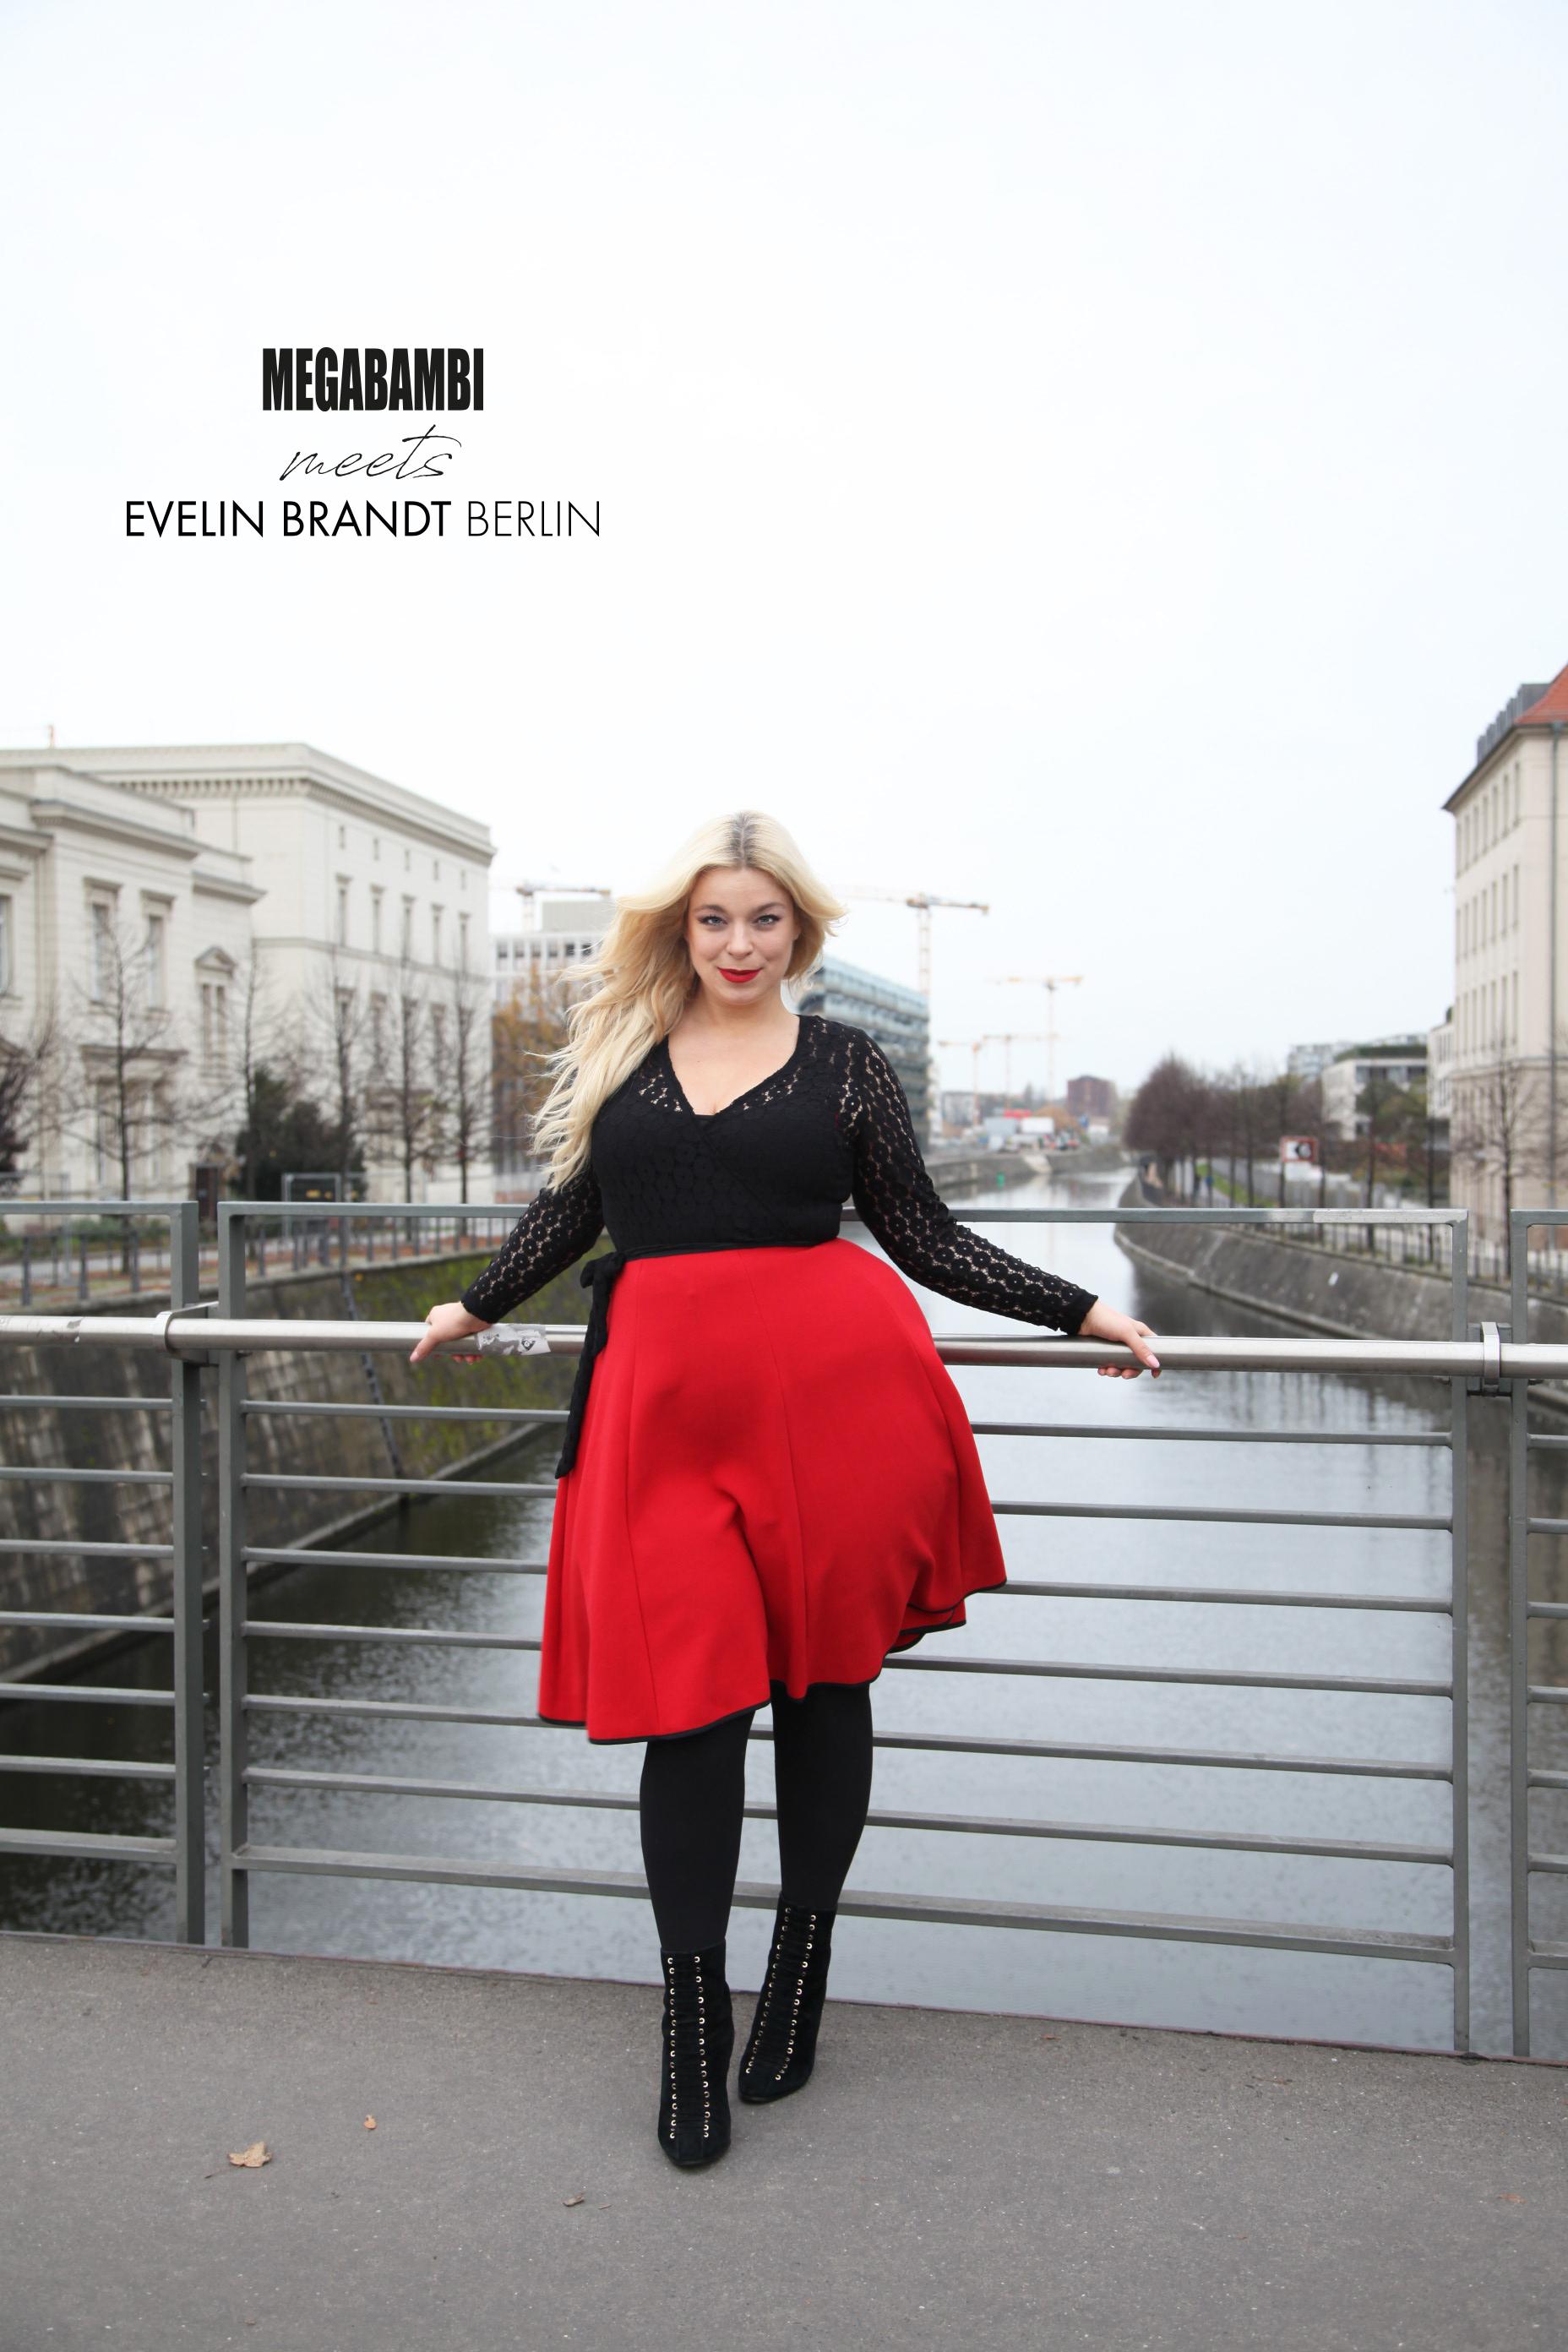 Megabambi-Evelin-Brandt-berlin-caterina-pogorzelski